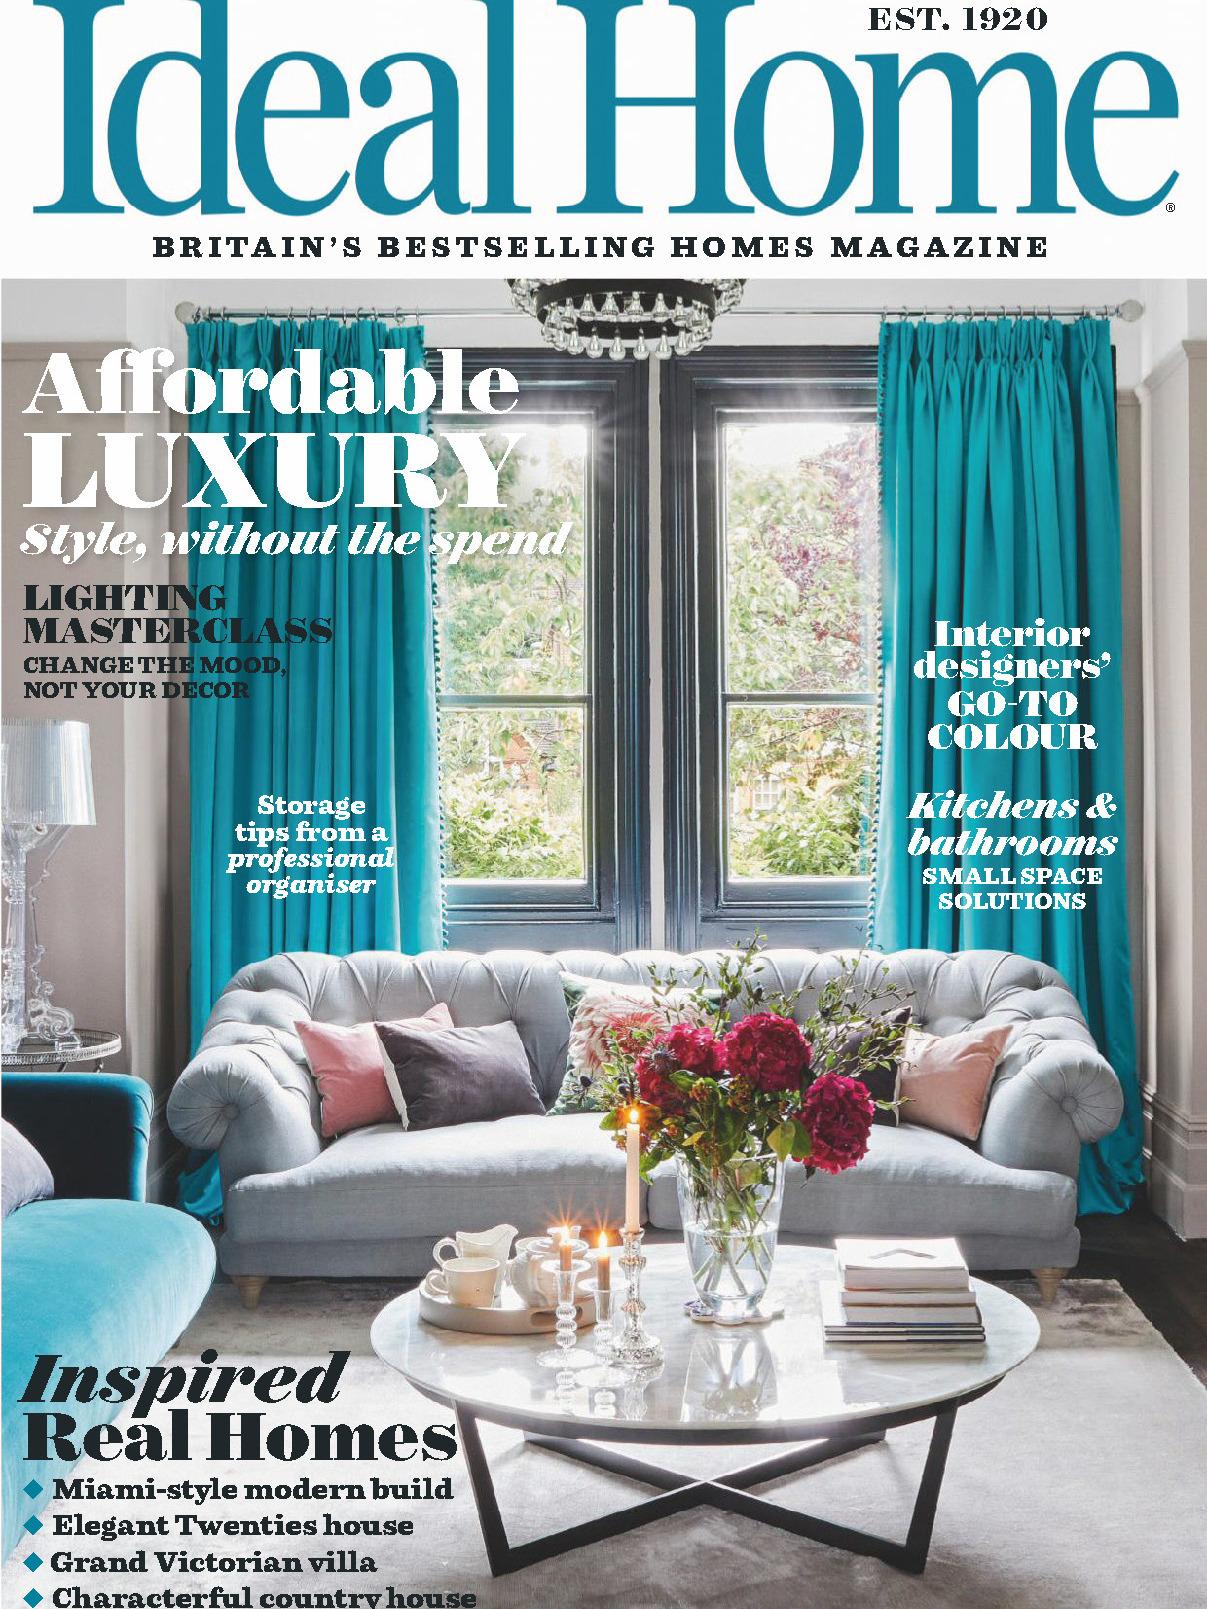 《Ideal Home》英国版理想的家园杂志2019年11月号